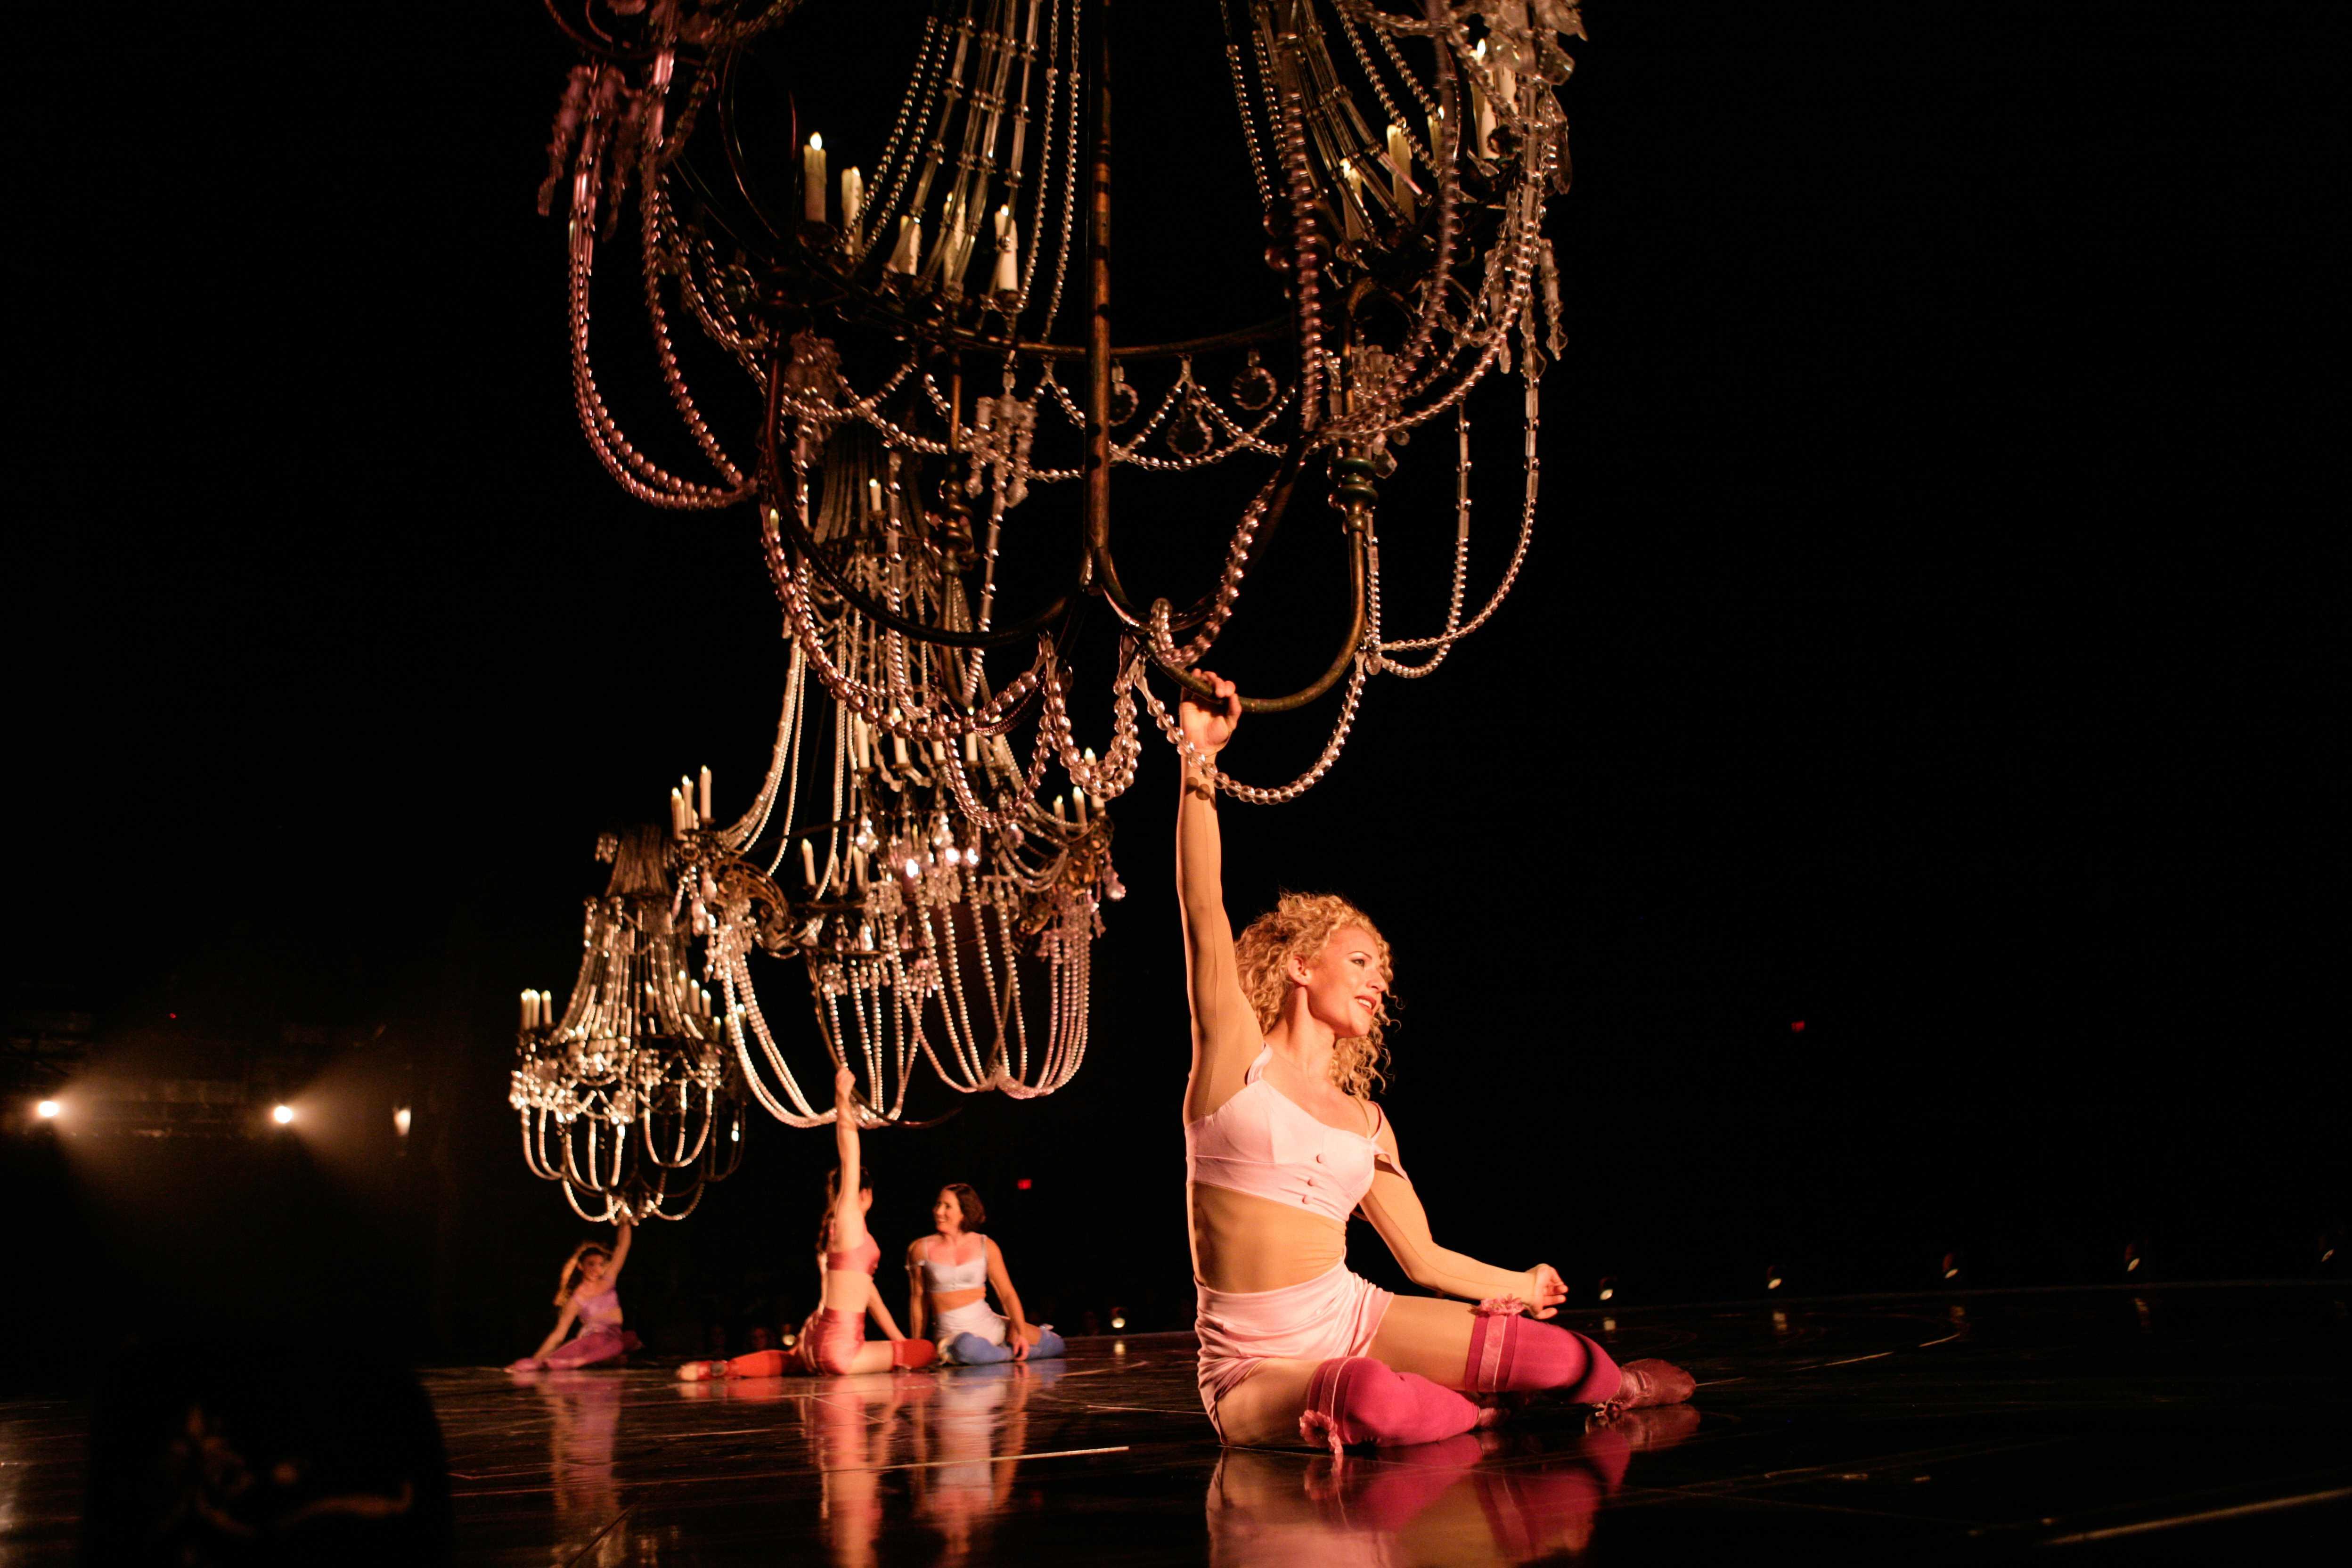 Cirque du Soleil - Corteo - Acrobata